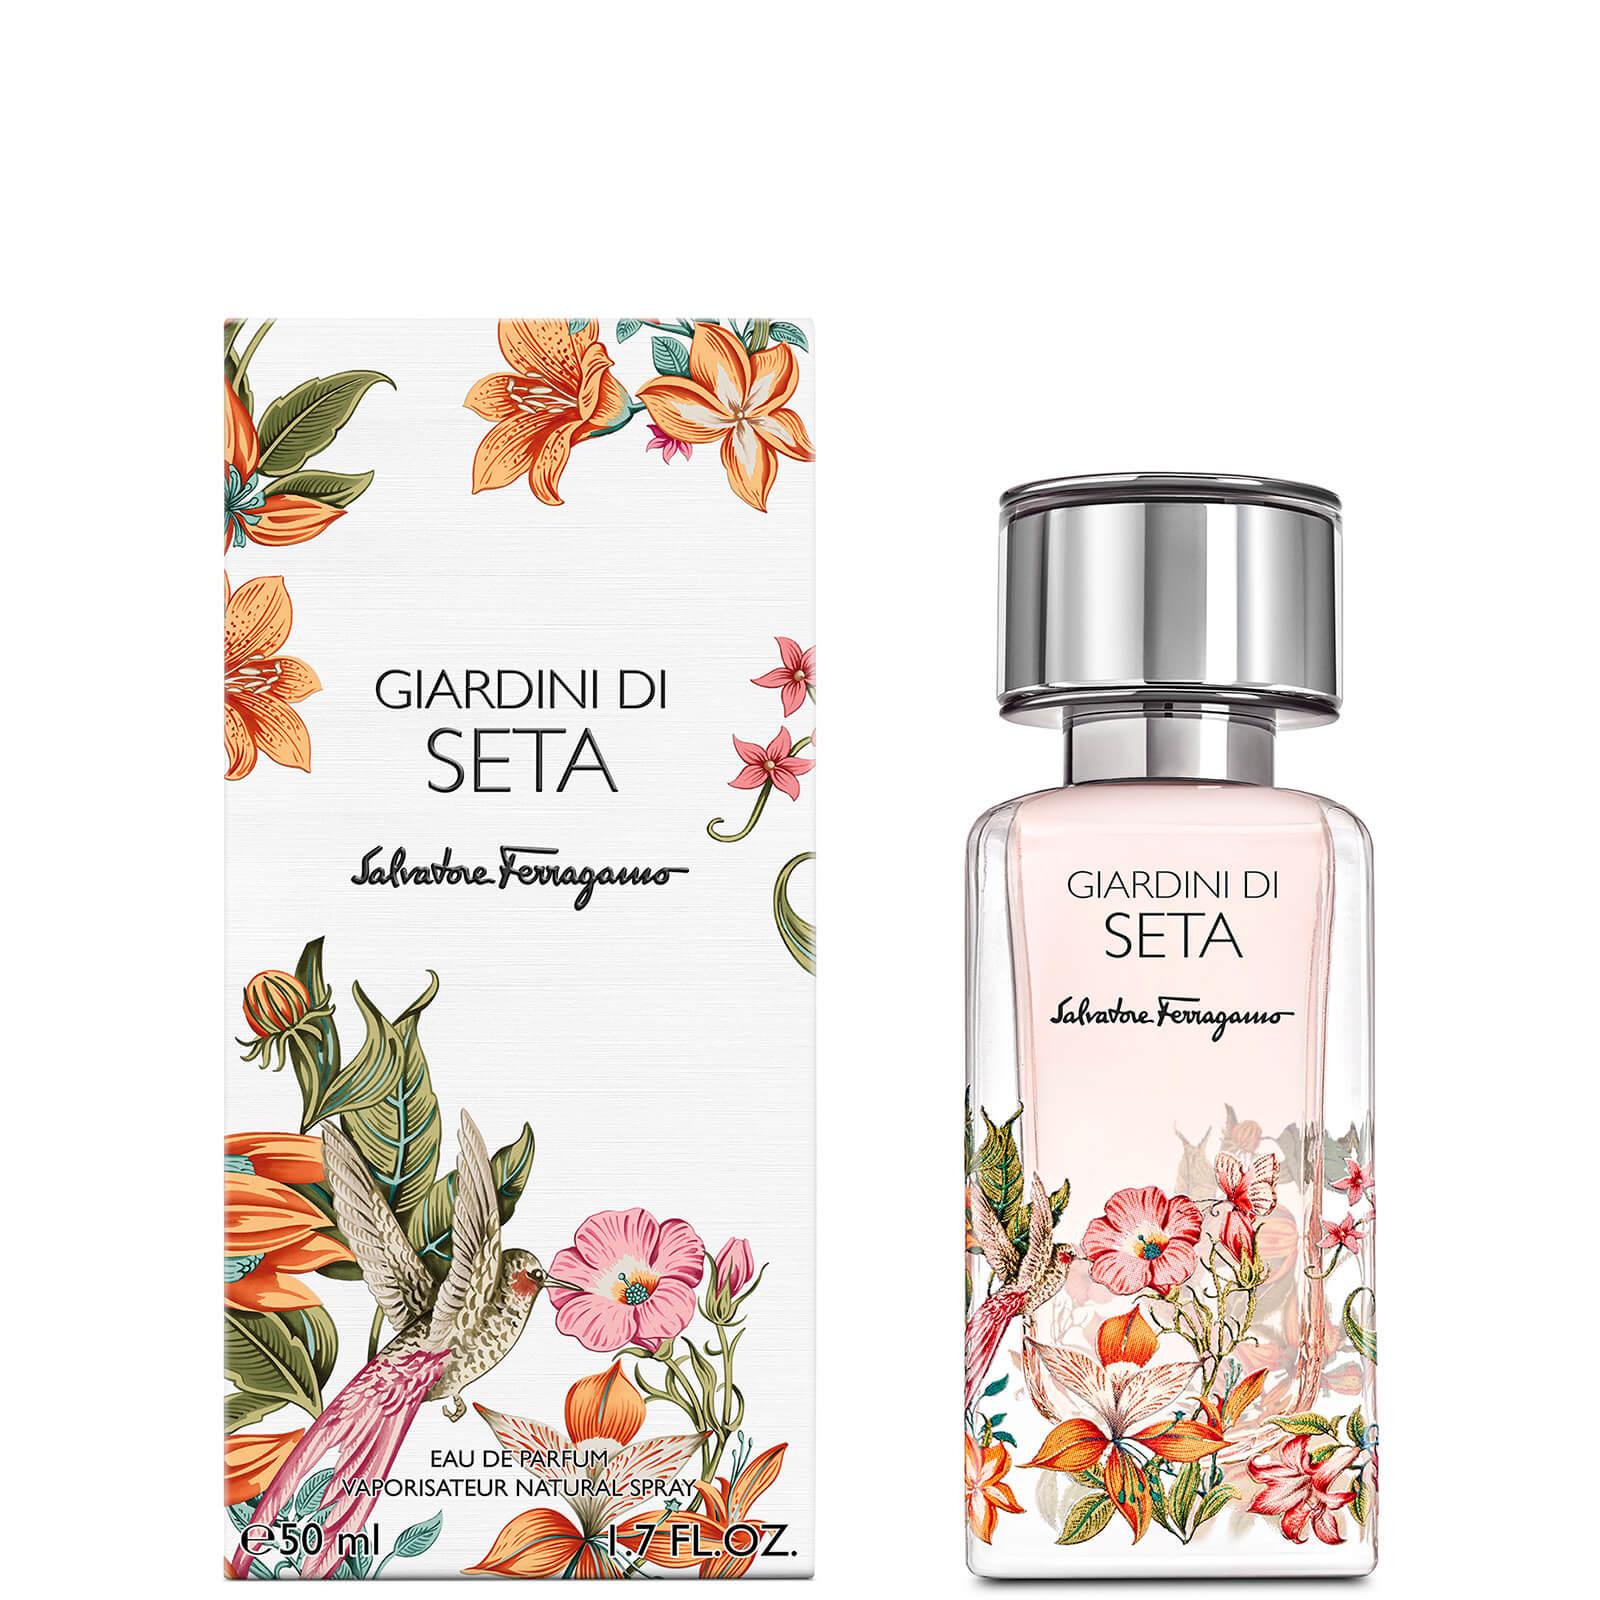 Image of Eau de Parfum Storie Giardini Di Seta Salvatore Ferragamo 50ml